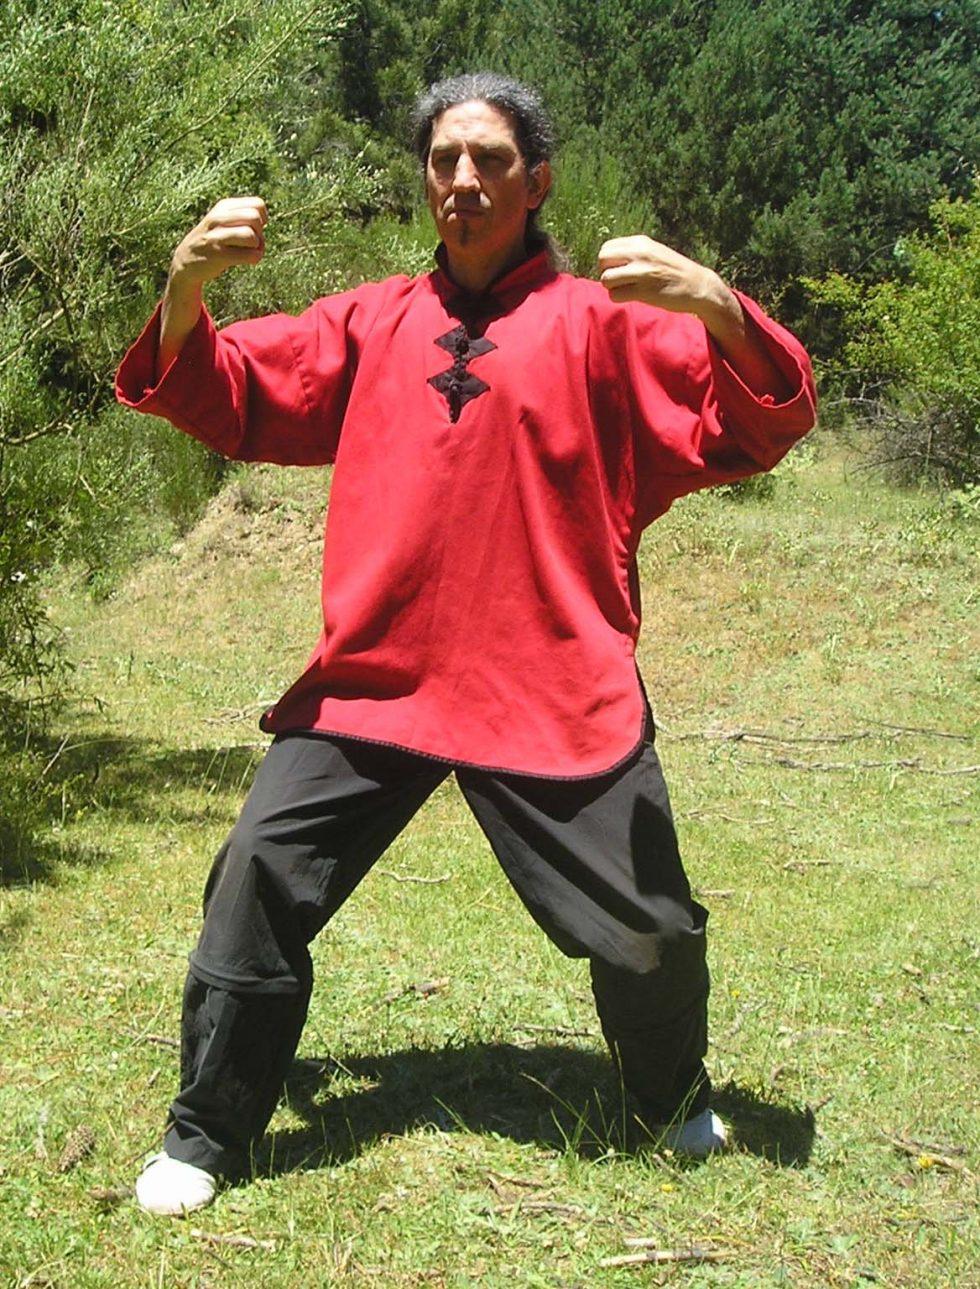 chi-kung-profesor-animales